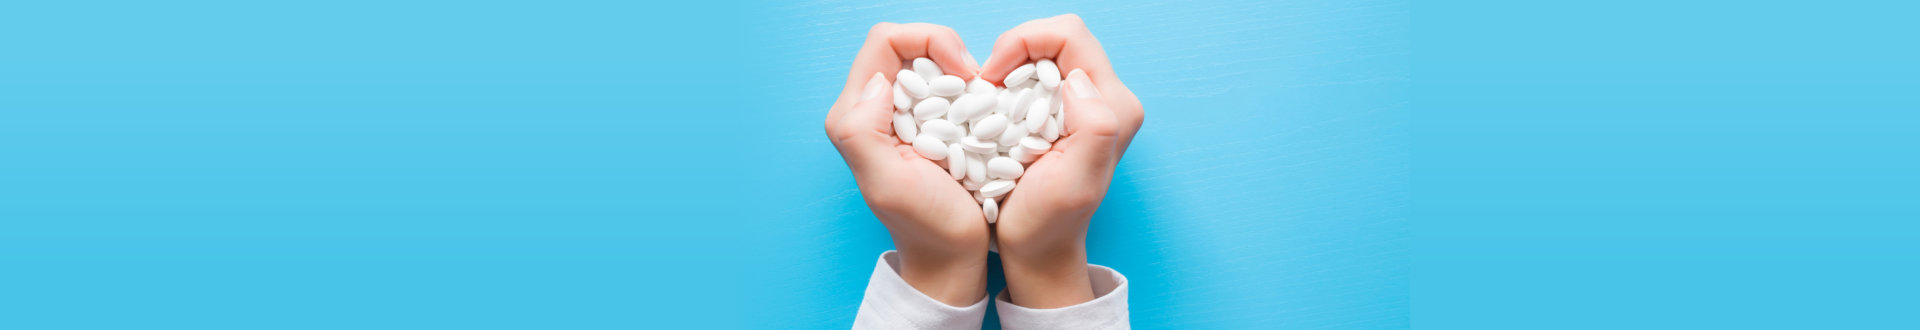 hand full of medicine